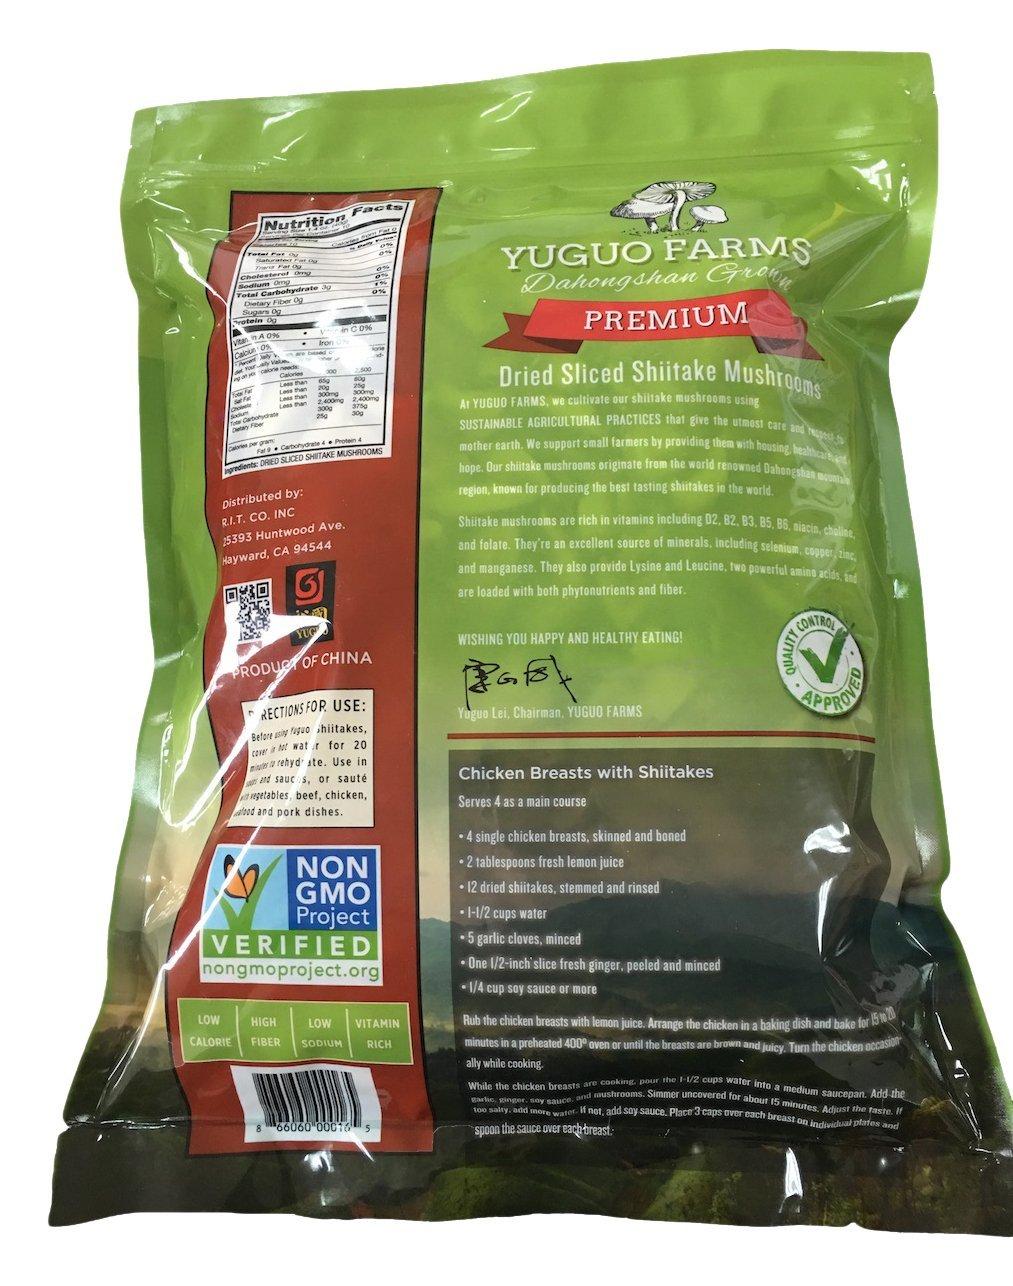 Yuguo Farms Dried Sliced Shiitake Mushrooms 100% Naturally Grown, NON-GMO, 14 oz bag, 10 Pack